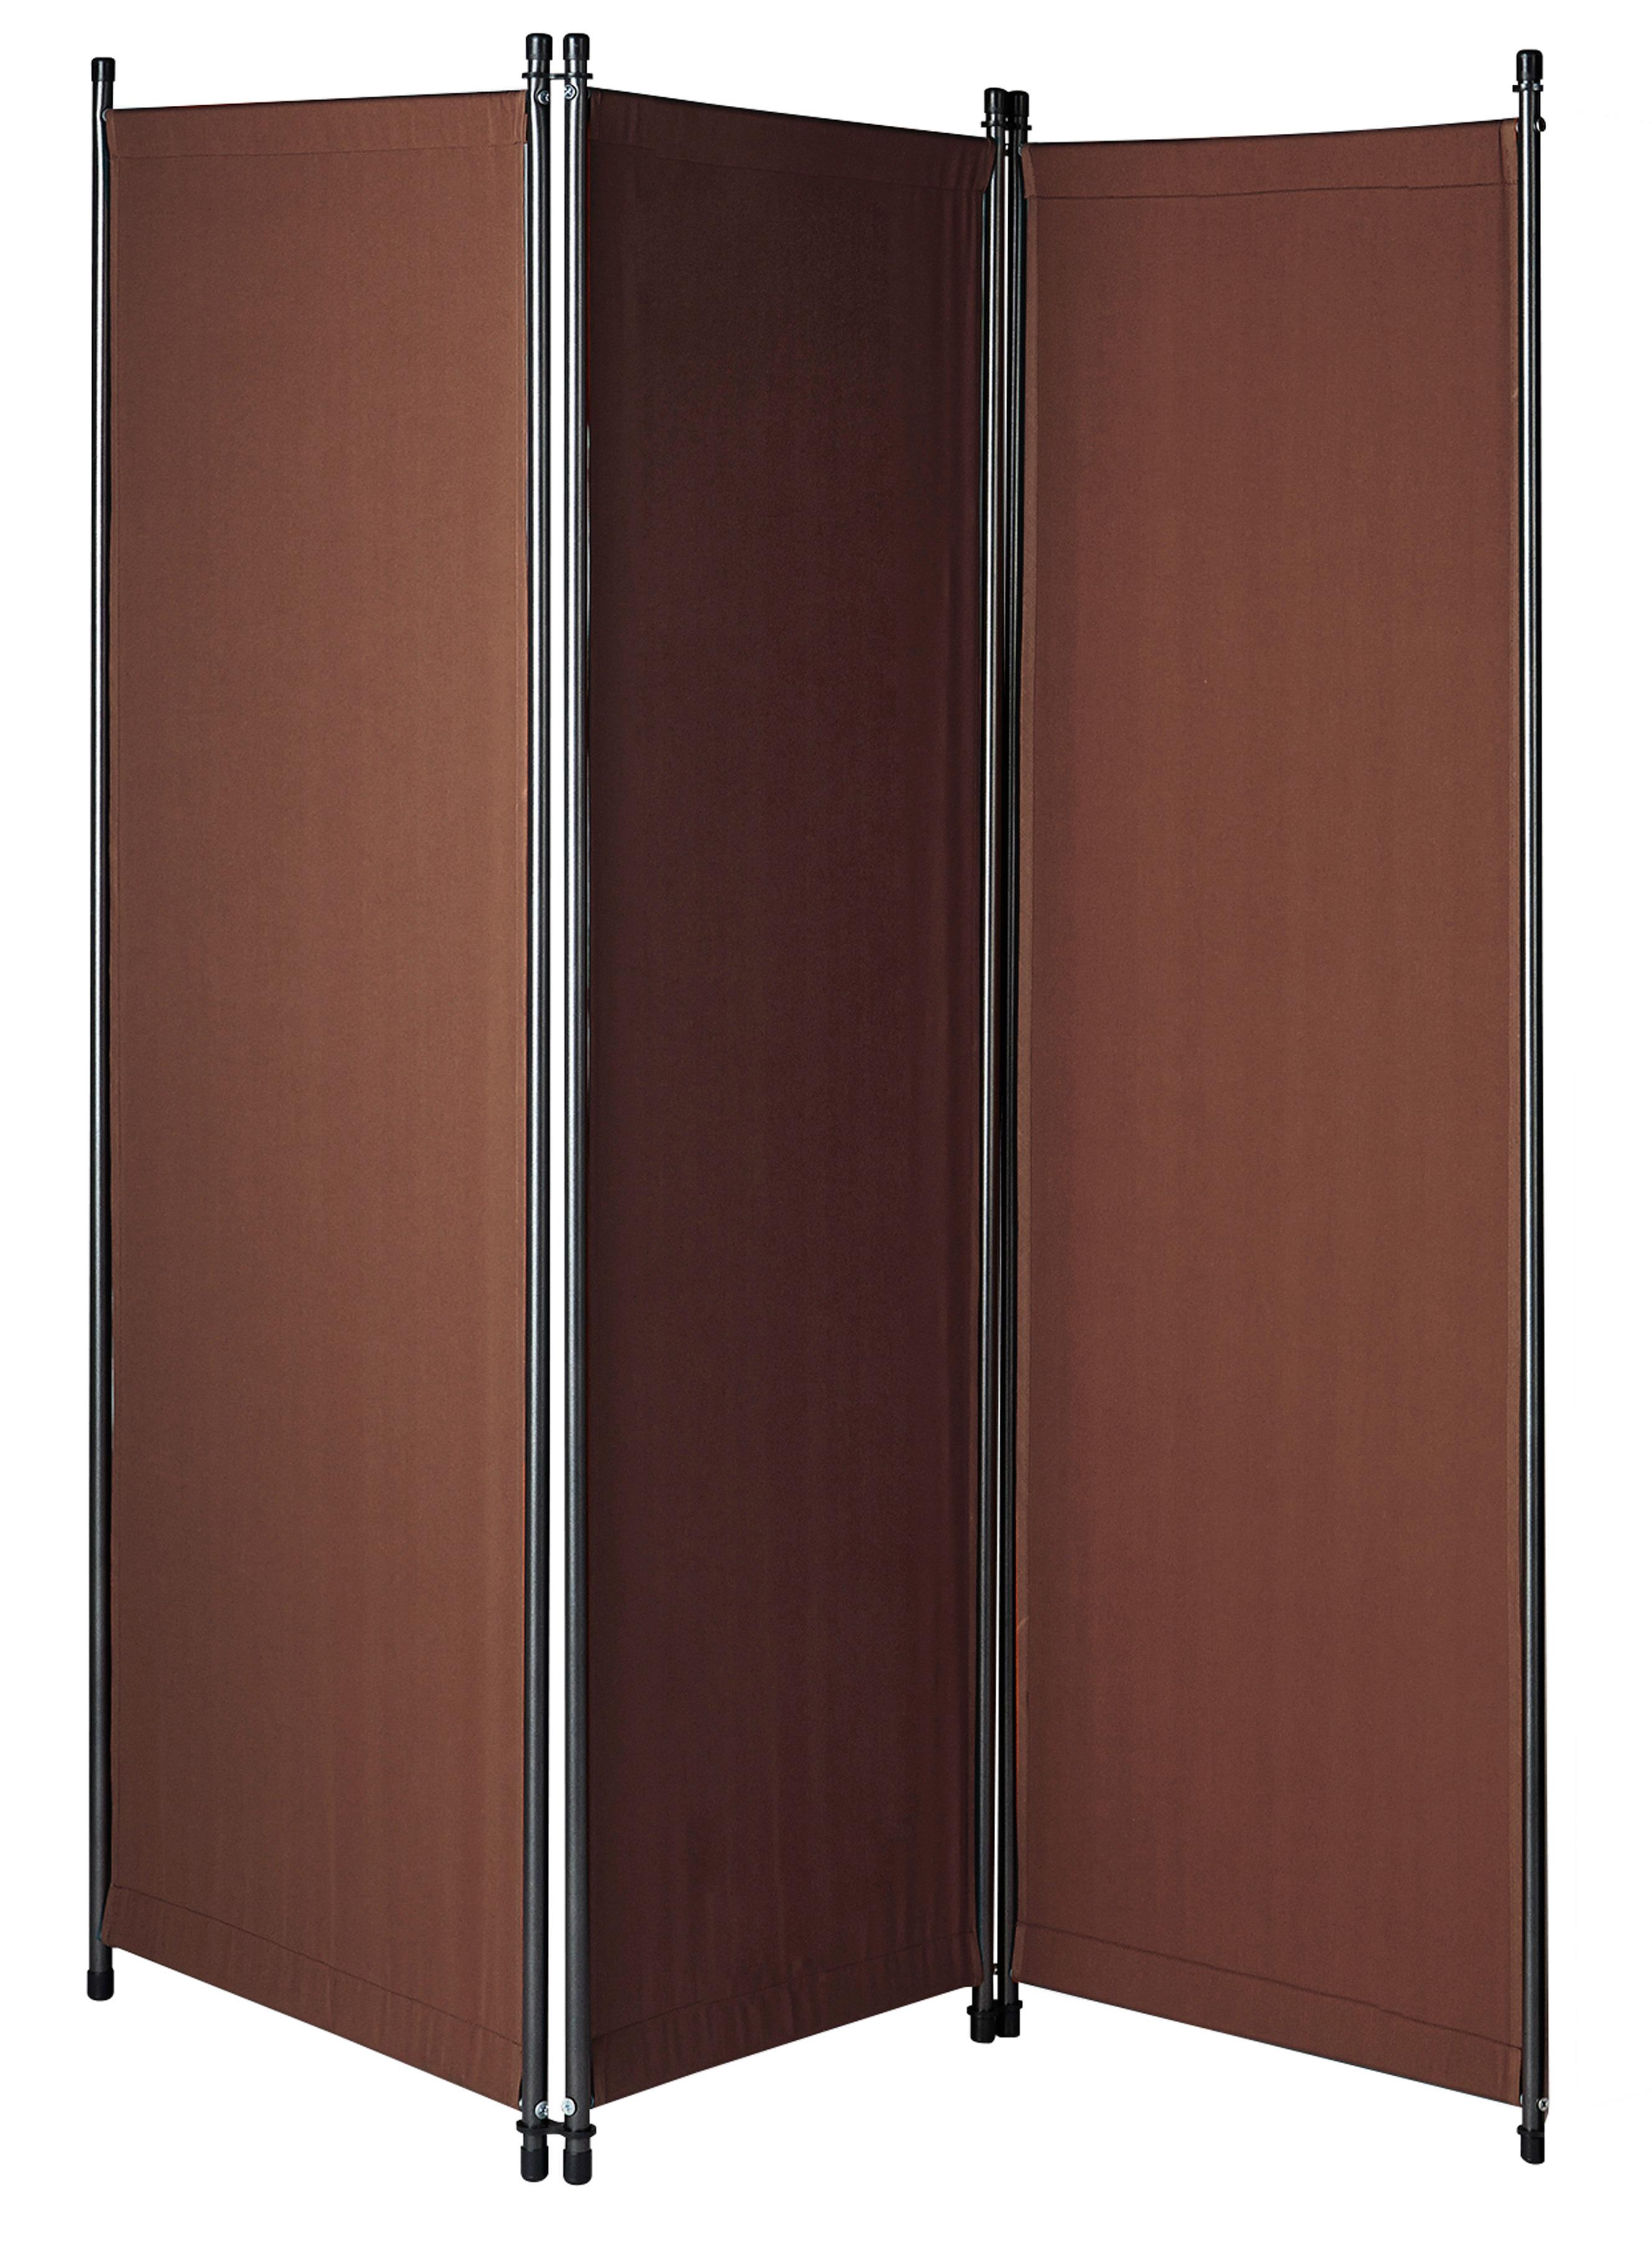 paravent swingtex b h ca 165x165 cm online kaufen. Black Bedroom Furniture Sets. Home Design Ideas